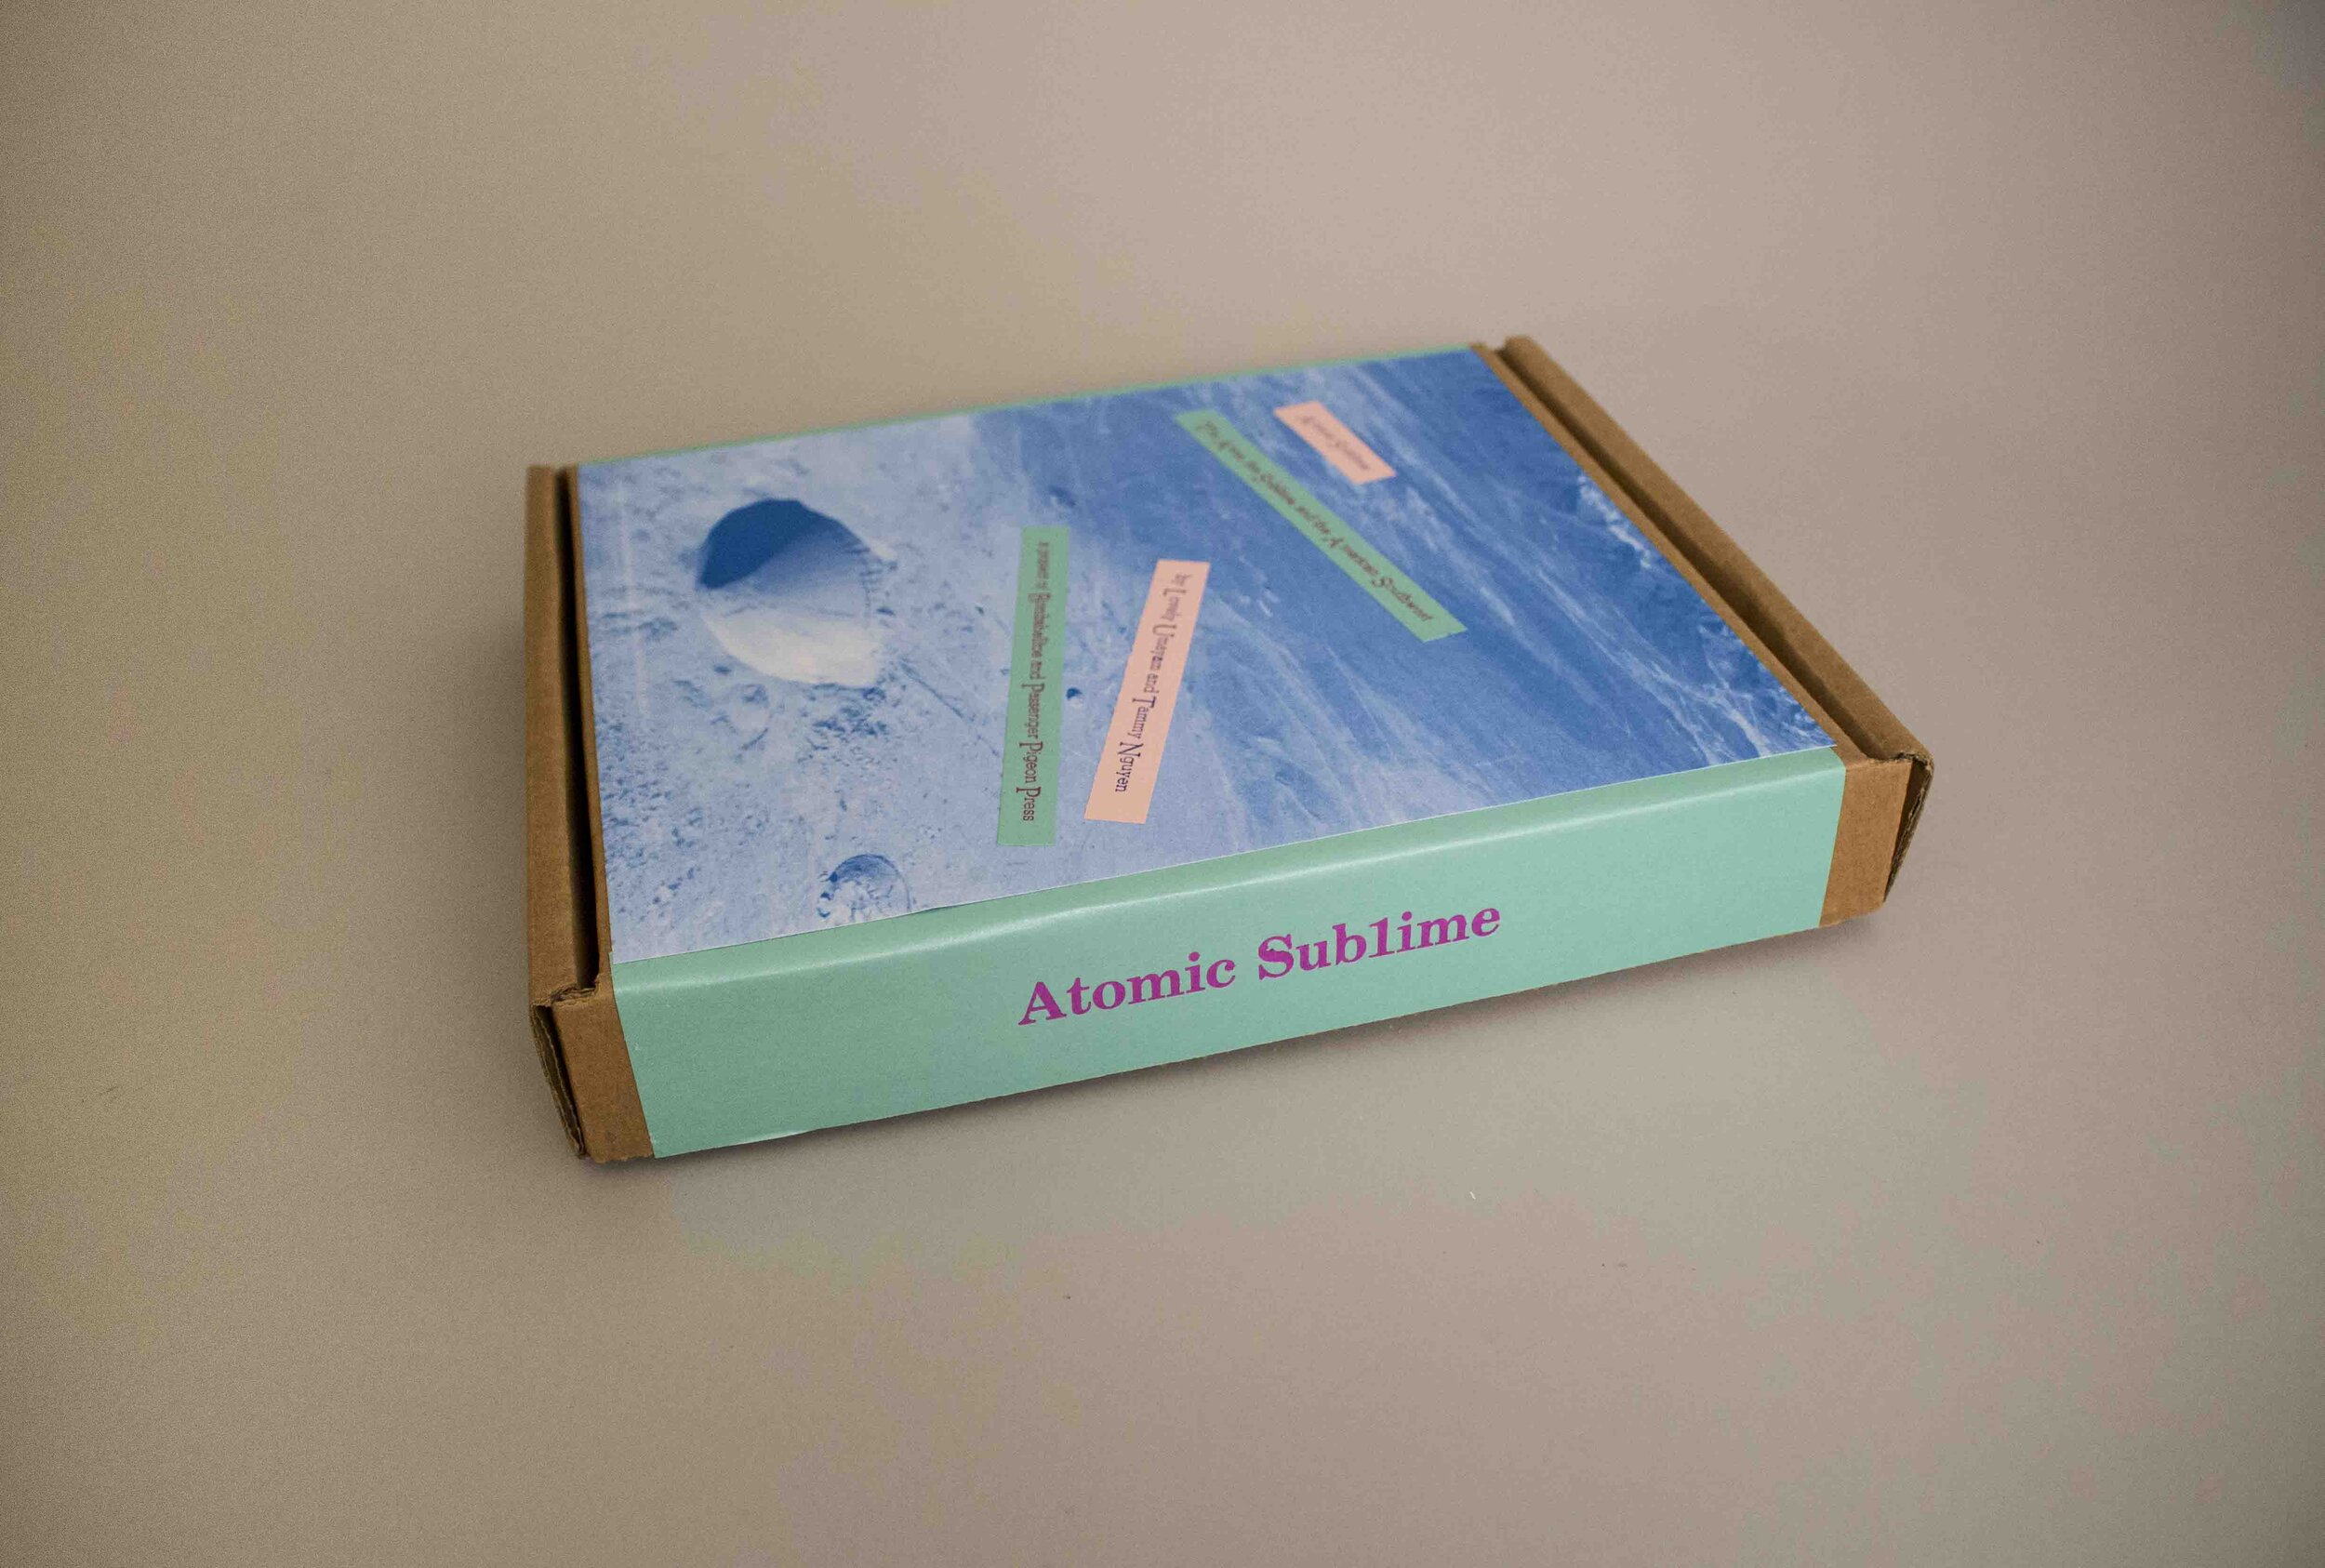 Atomic_MQ1308.jpg